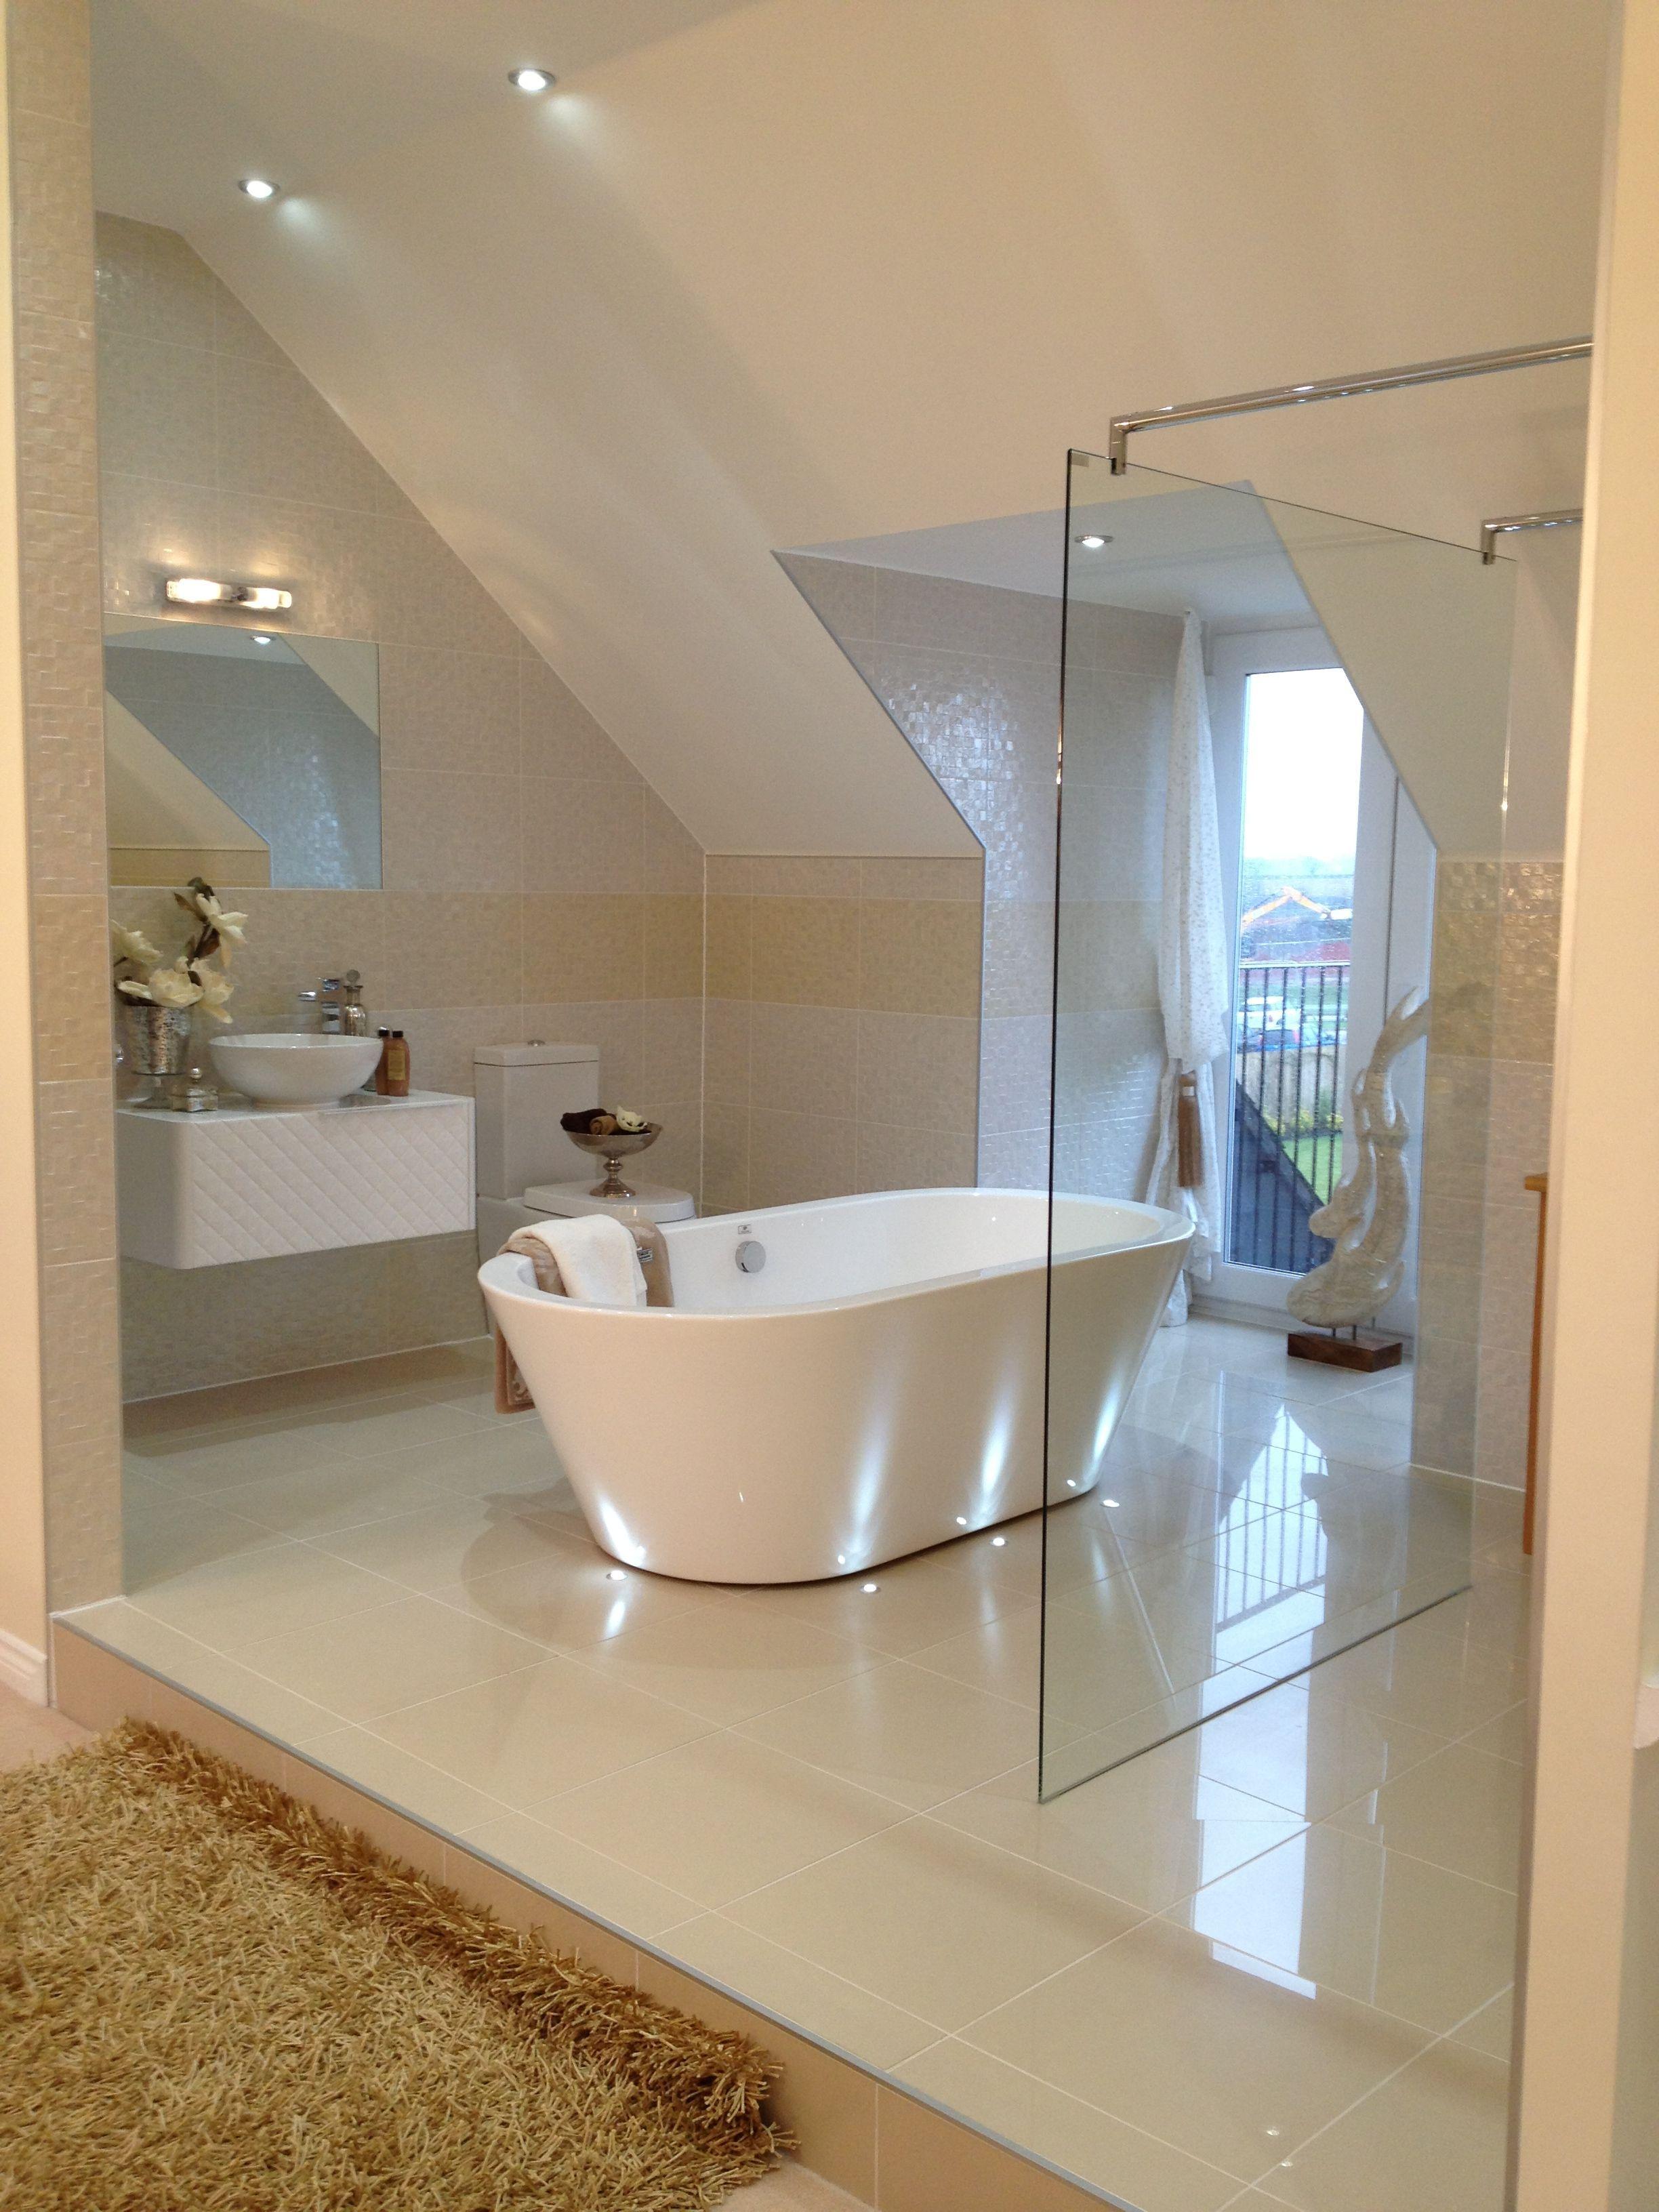 Luxury Open Plan Ensuite Beautiful Luxuryensuitedesigns Open Plan Bathrooms Open Plan Bathroom Design Bathroom Design